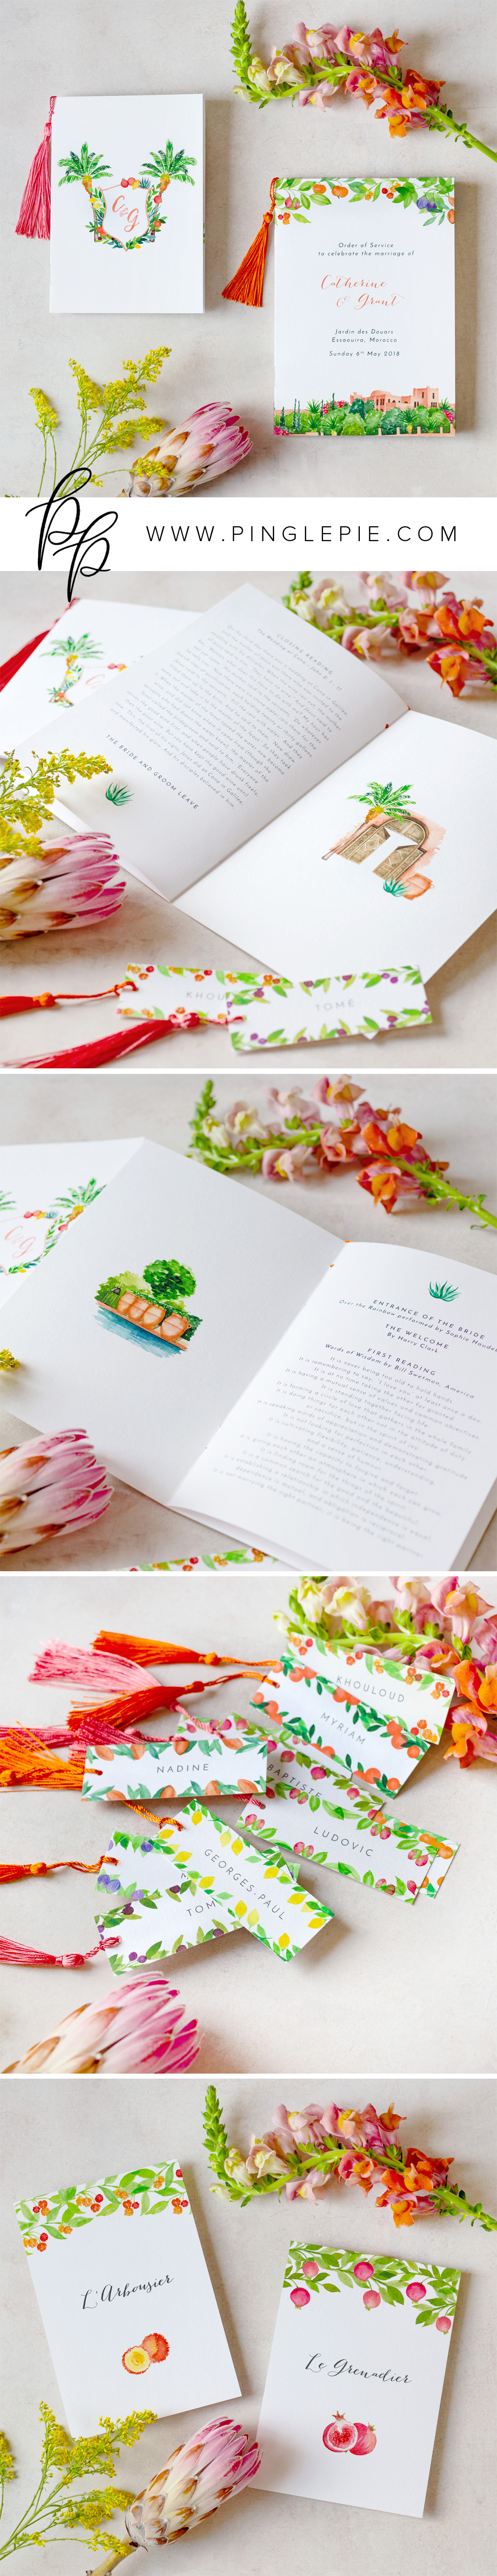 Bespoke Wedding Stationery - Bright Moroccan Design - Pingle Pie